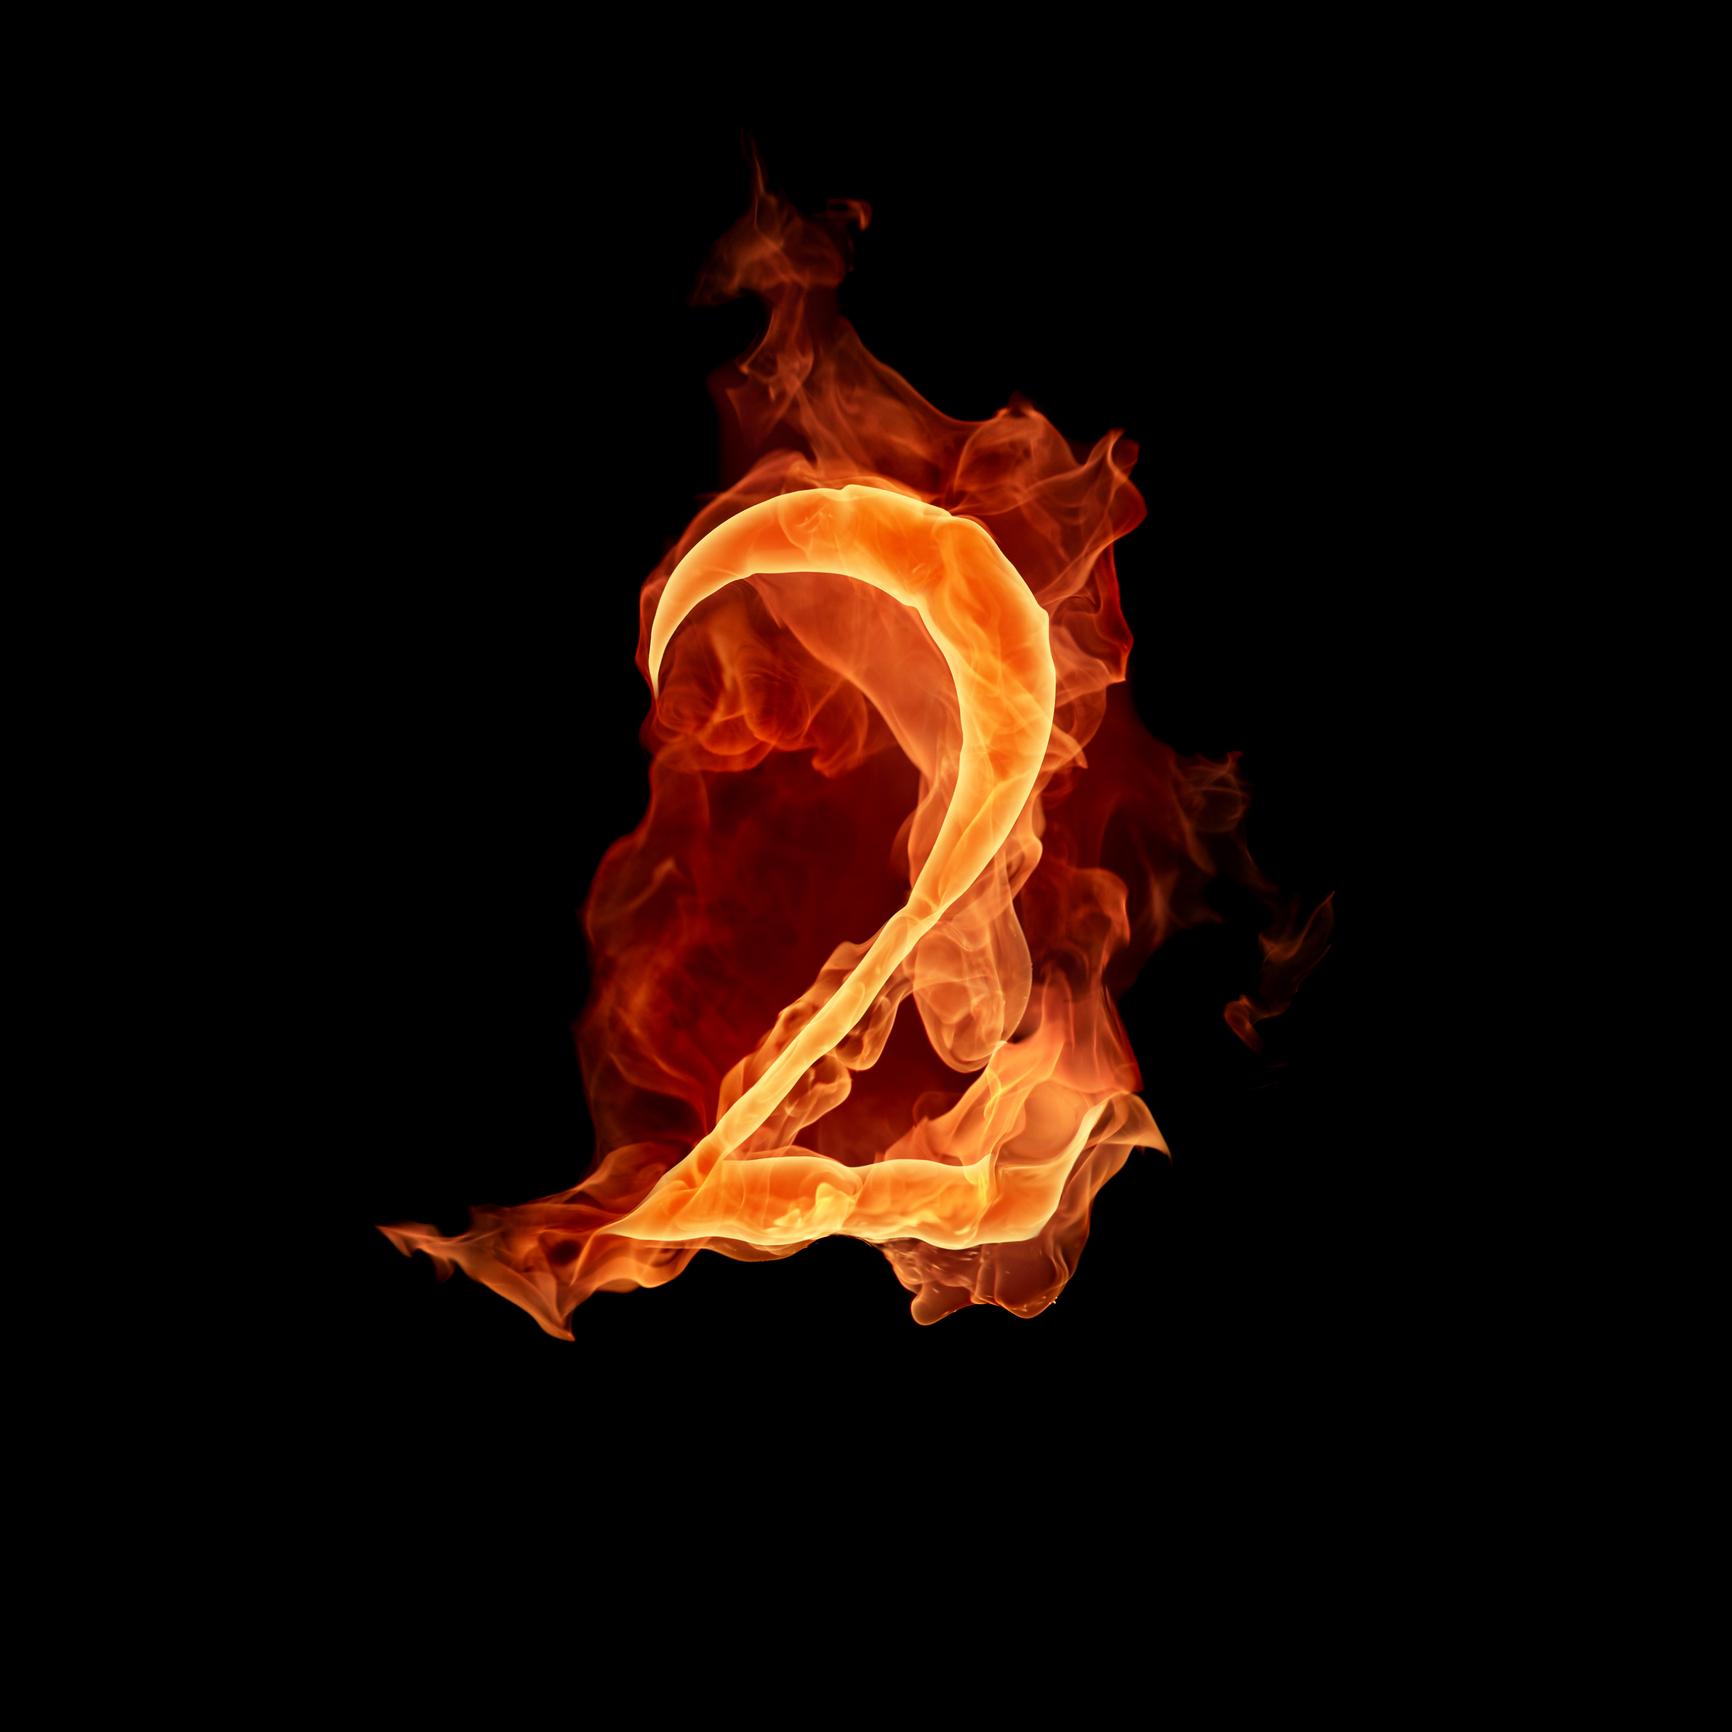 FLAMING 2